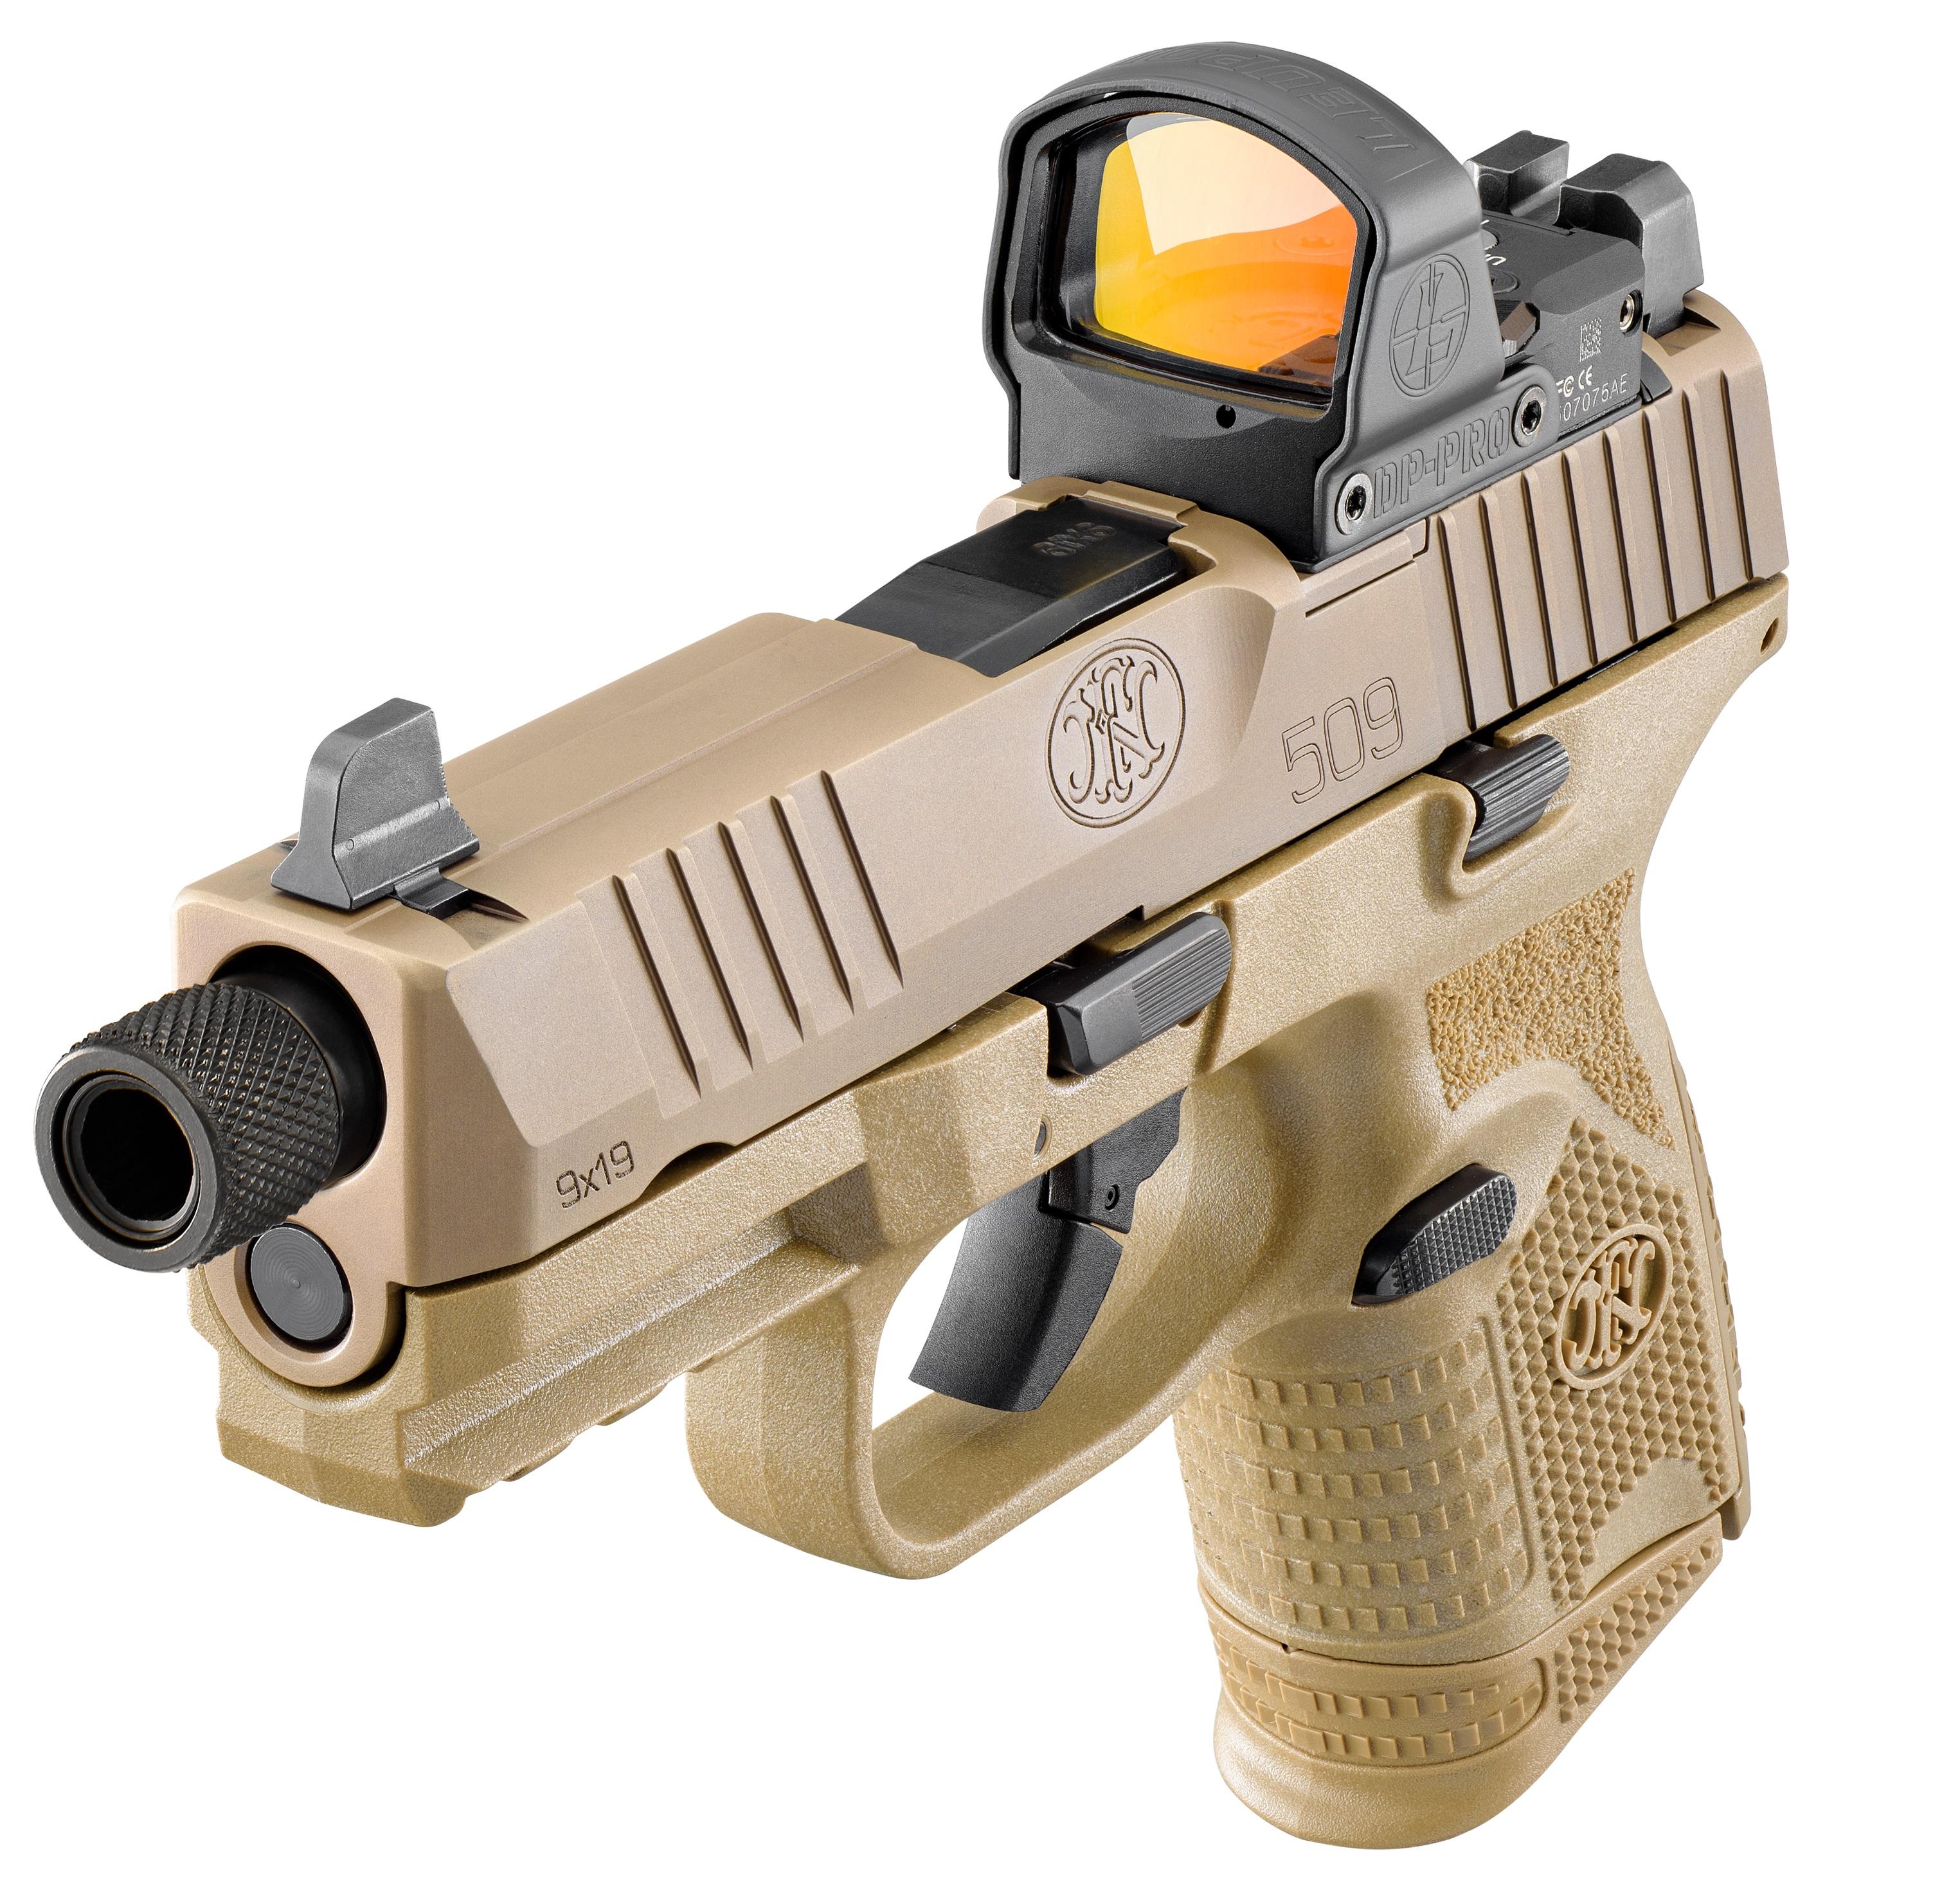 FN509C_Tact_FDE_DP_Pro_angleL.jpg